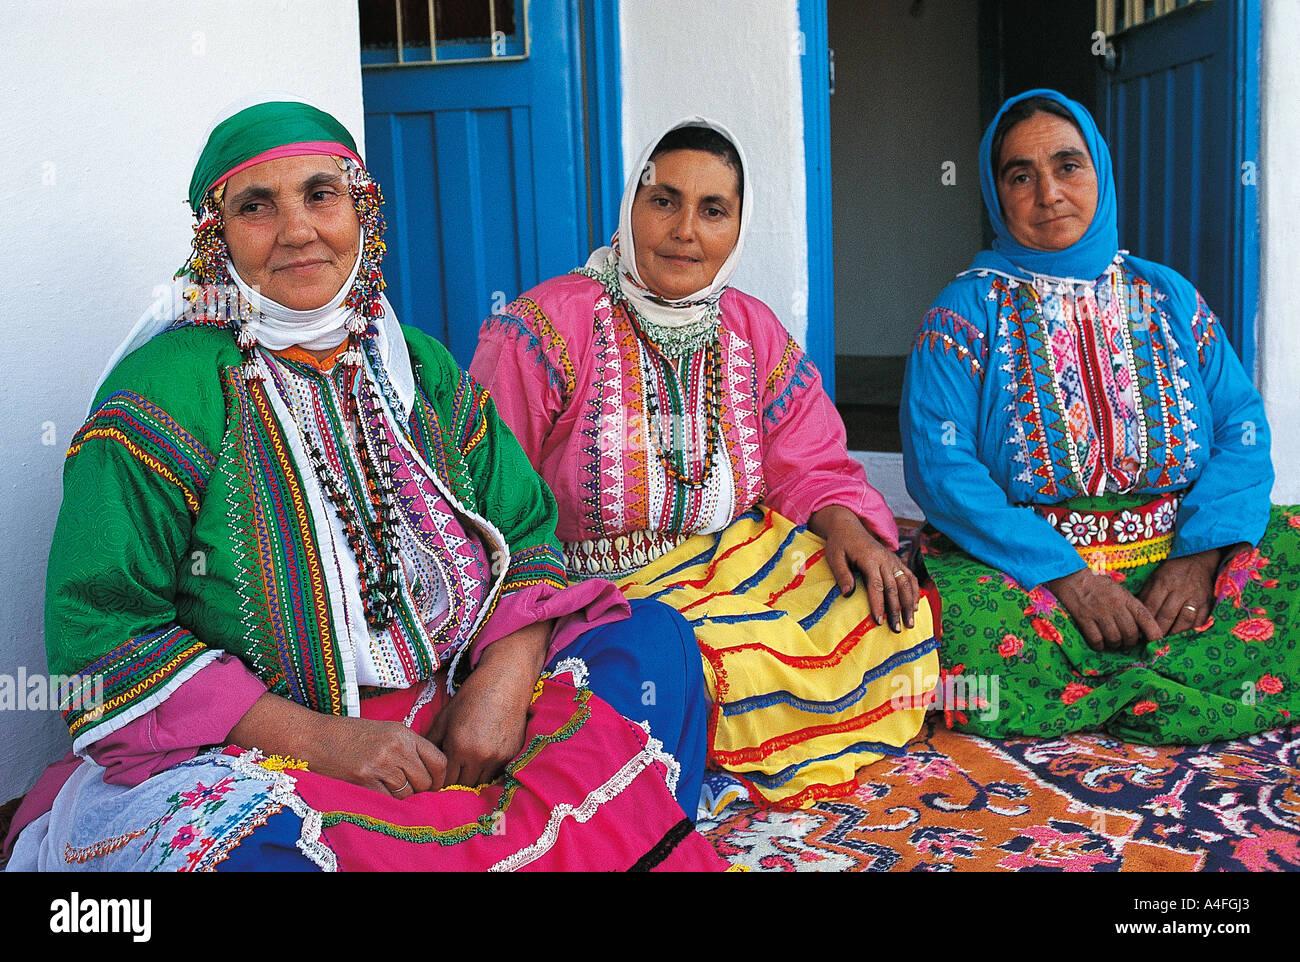 Turkmen Women In Traditional Clothes Bayindir Village Izmir Stock Photo Alamy